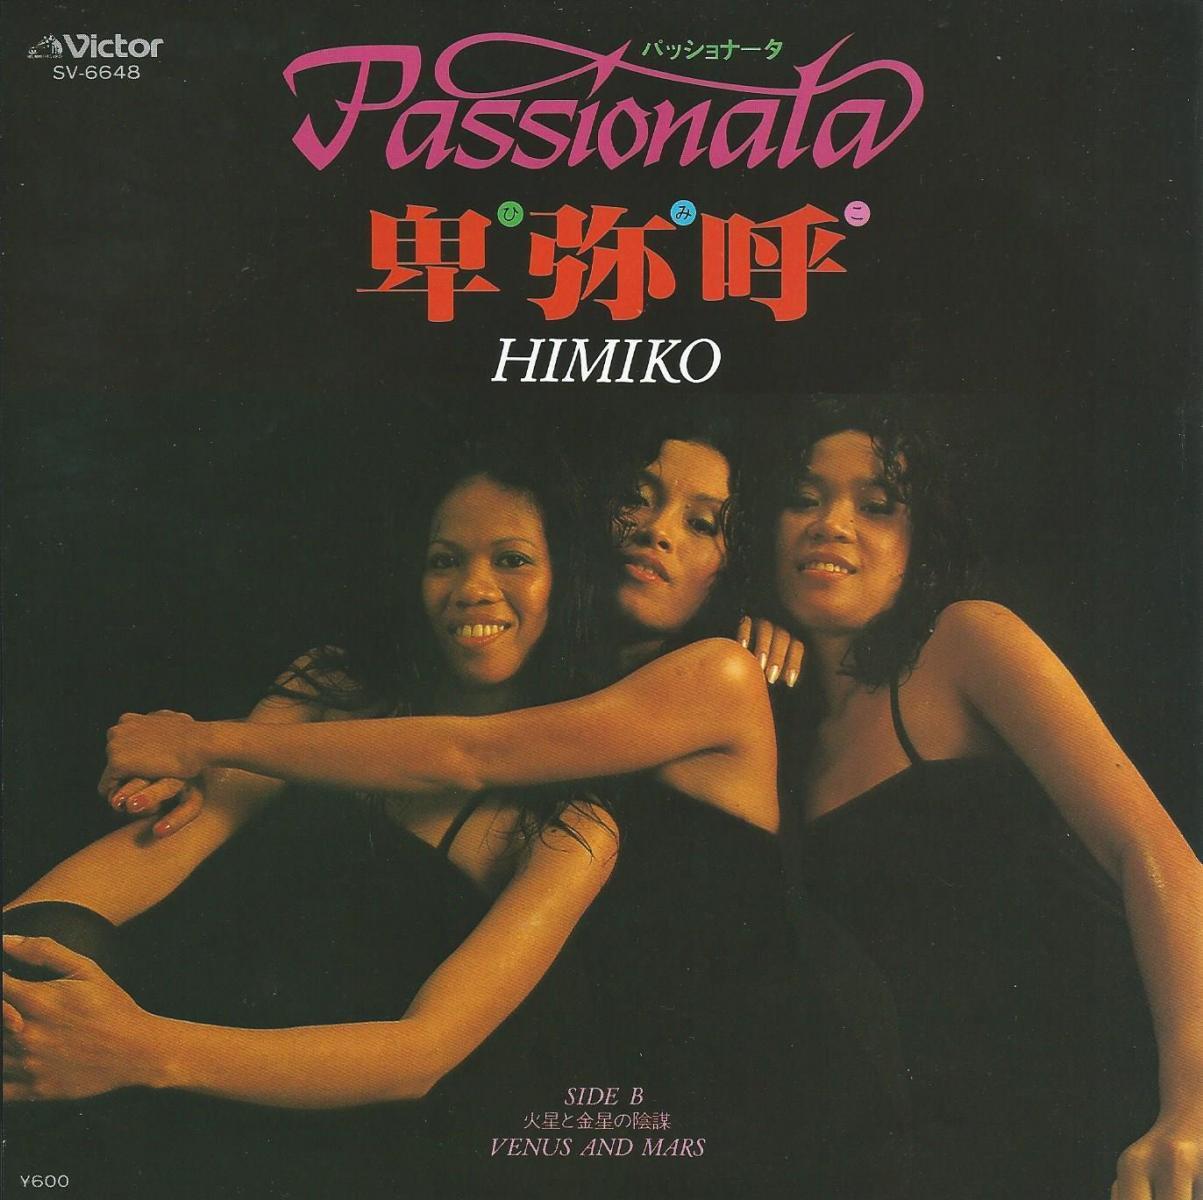 Passionata - Mysterious Passion